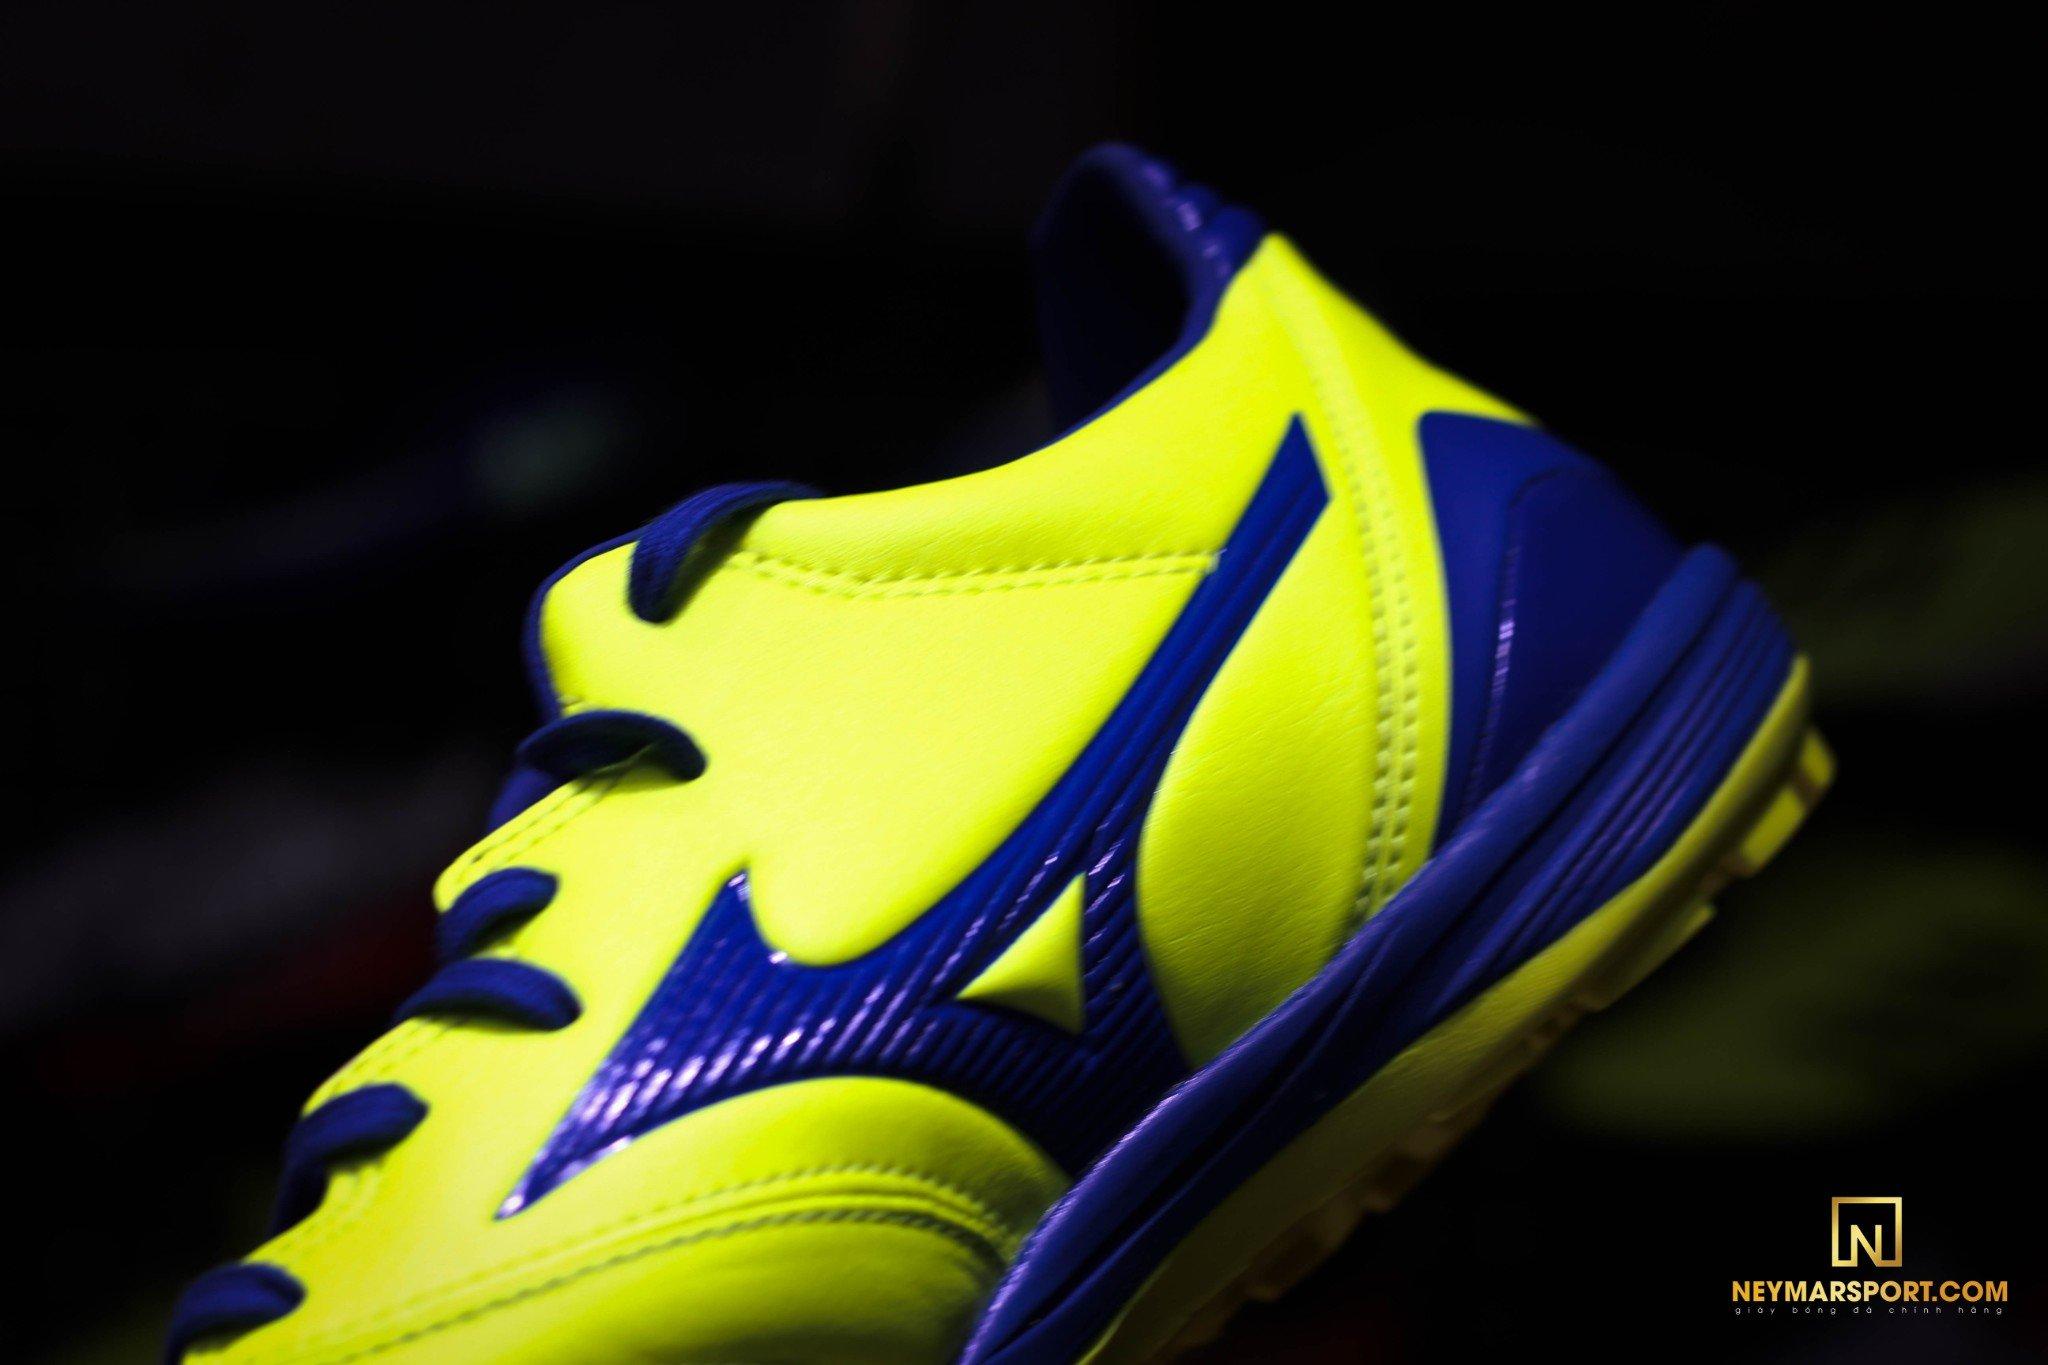 Giày đá banh chính hãng. Giày đá banh Mizuno. Mizuno Morelia KL AS